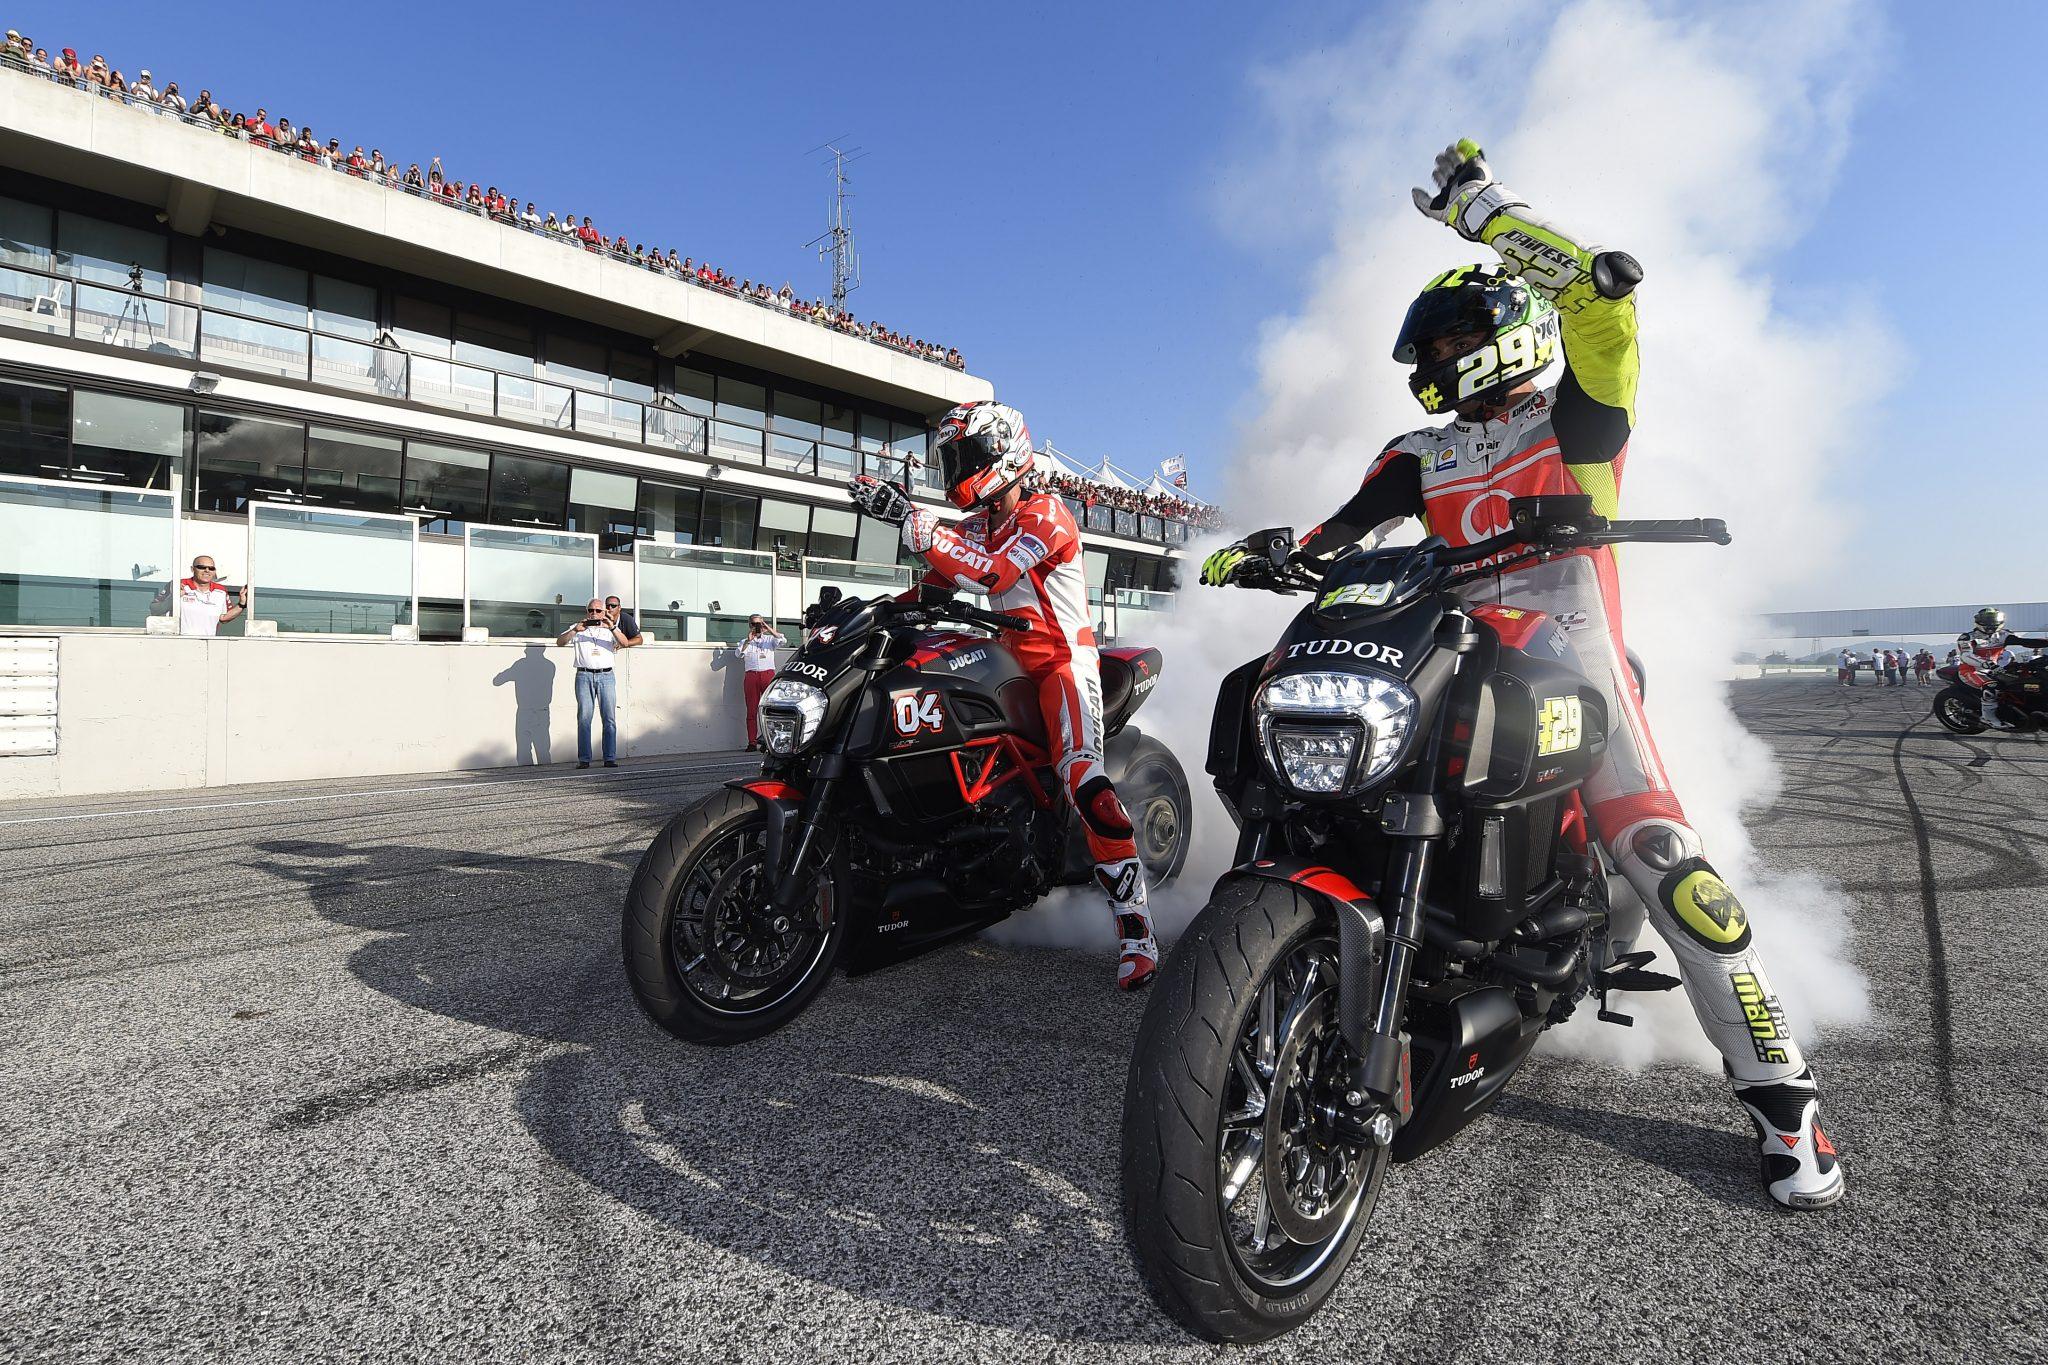 World Ducati Week 2016 keert terug